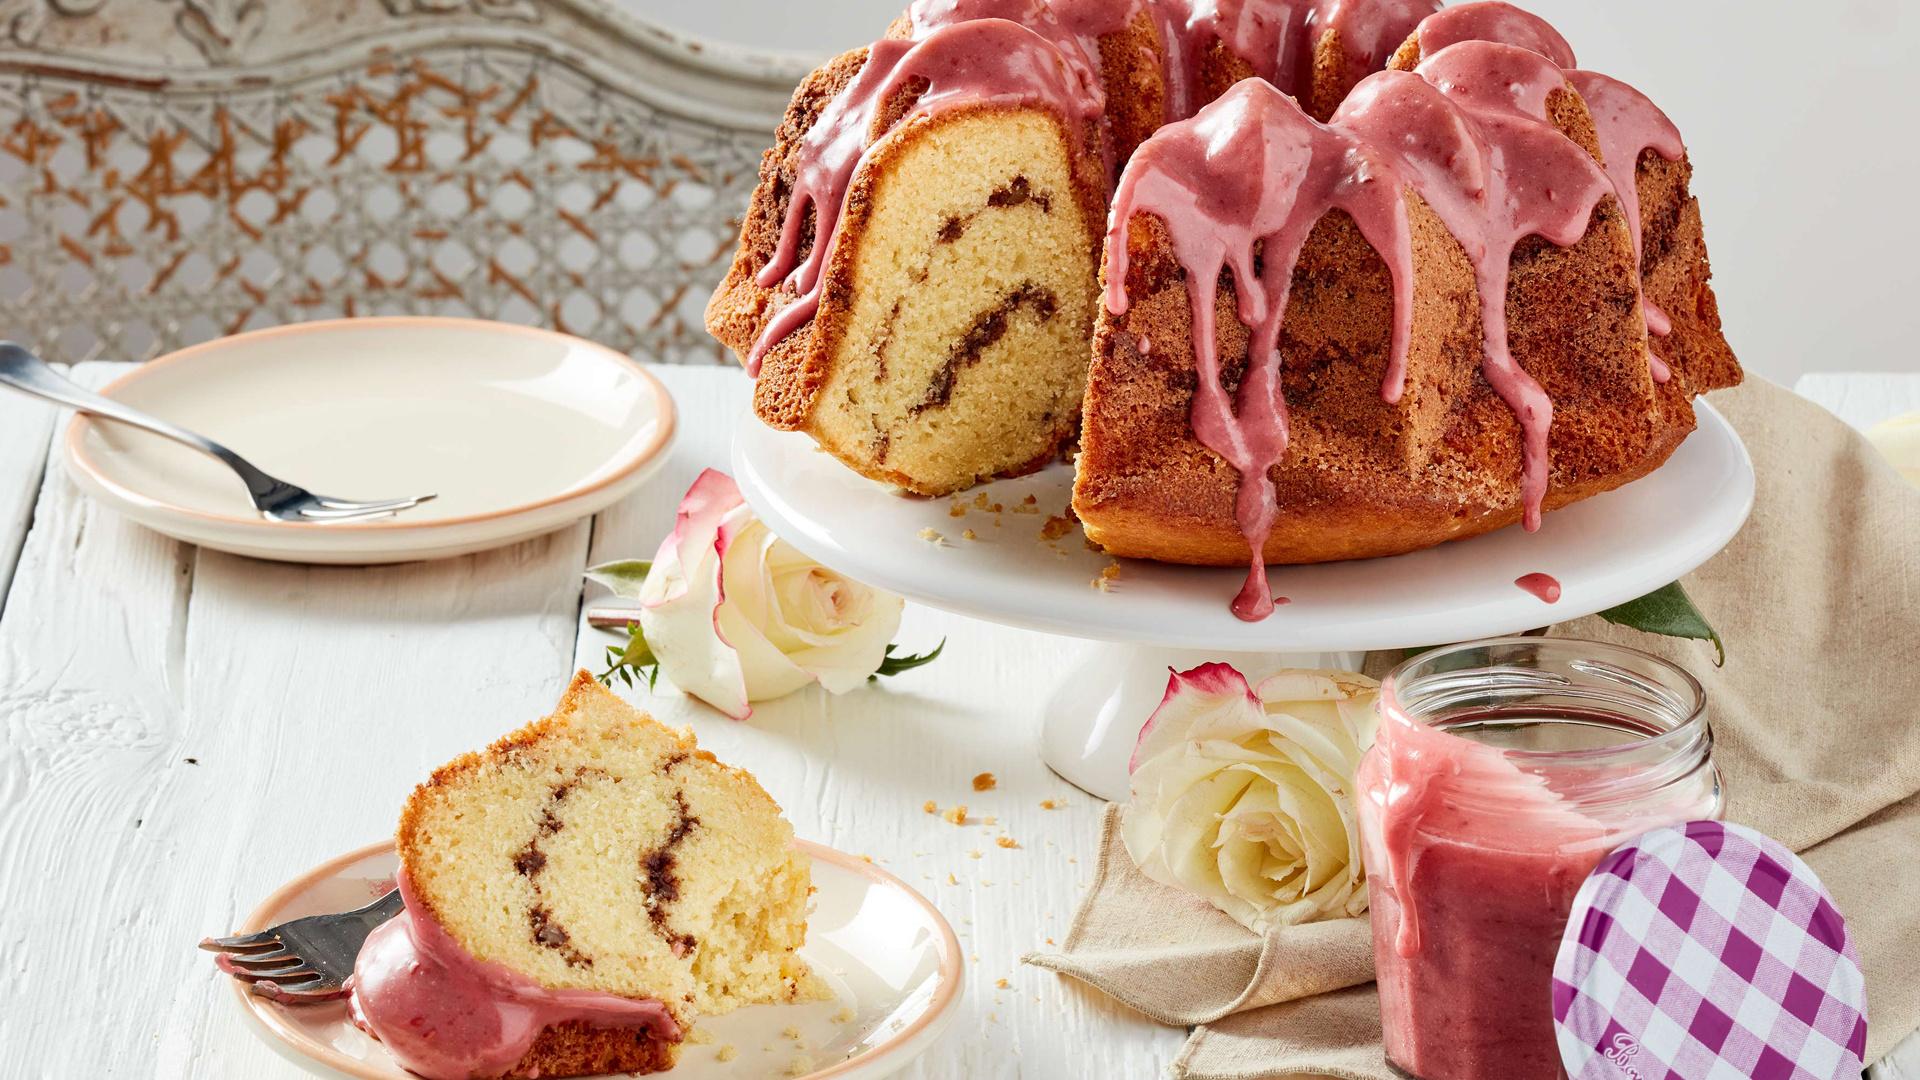 Raspberry bunt cake with Bonne Maman INTENSE Fruit Spreads